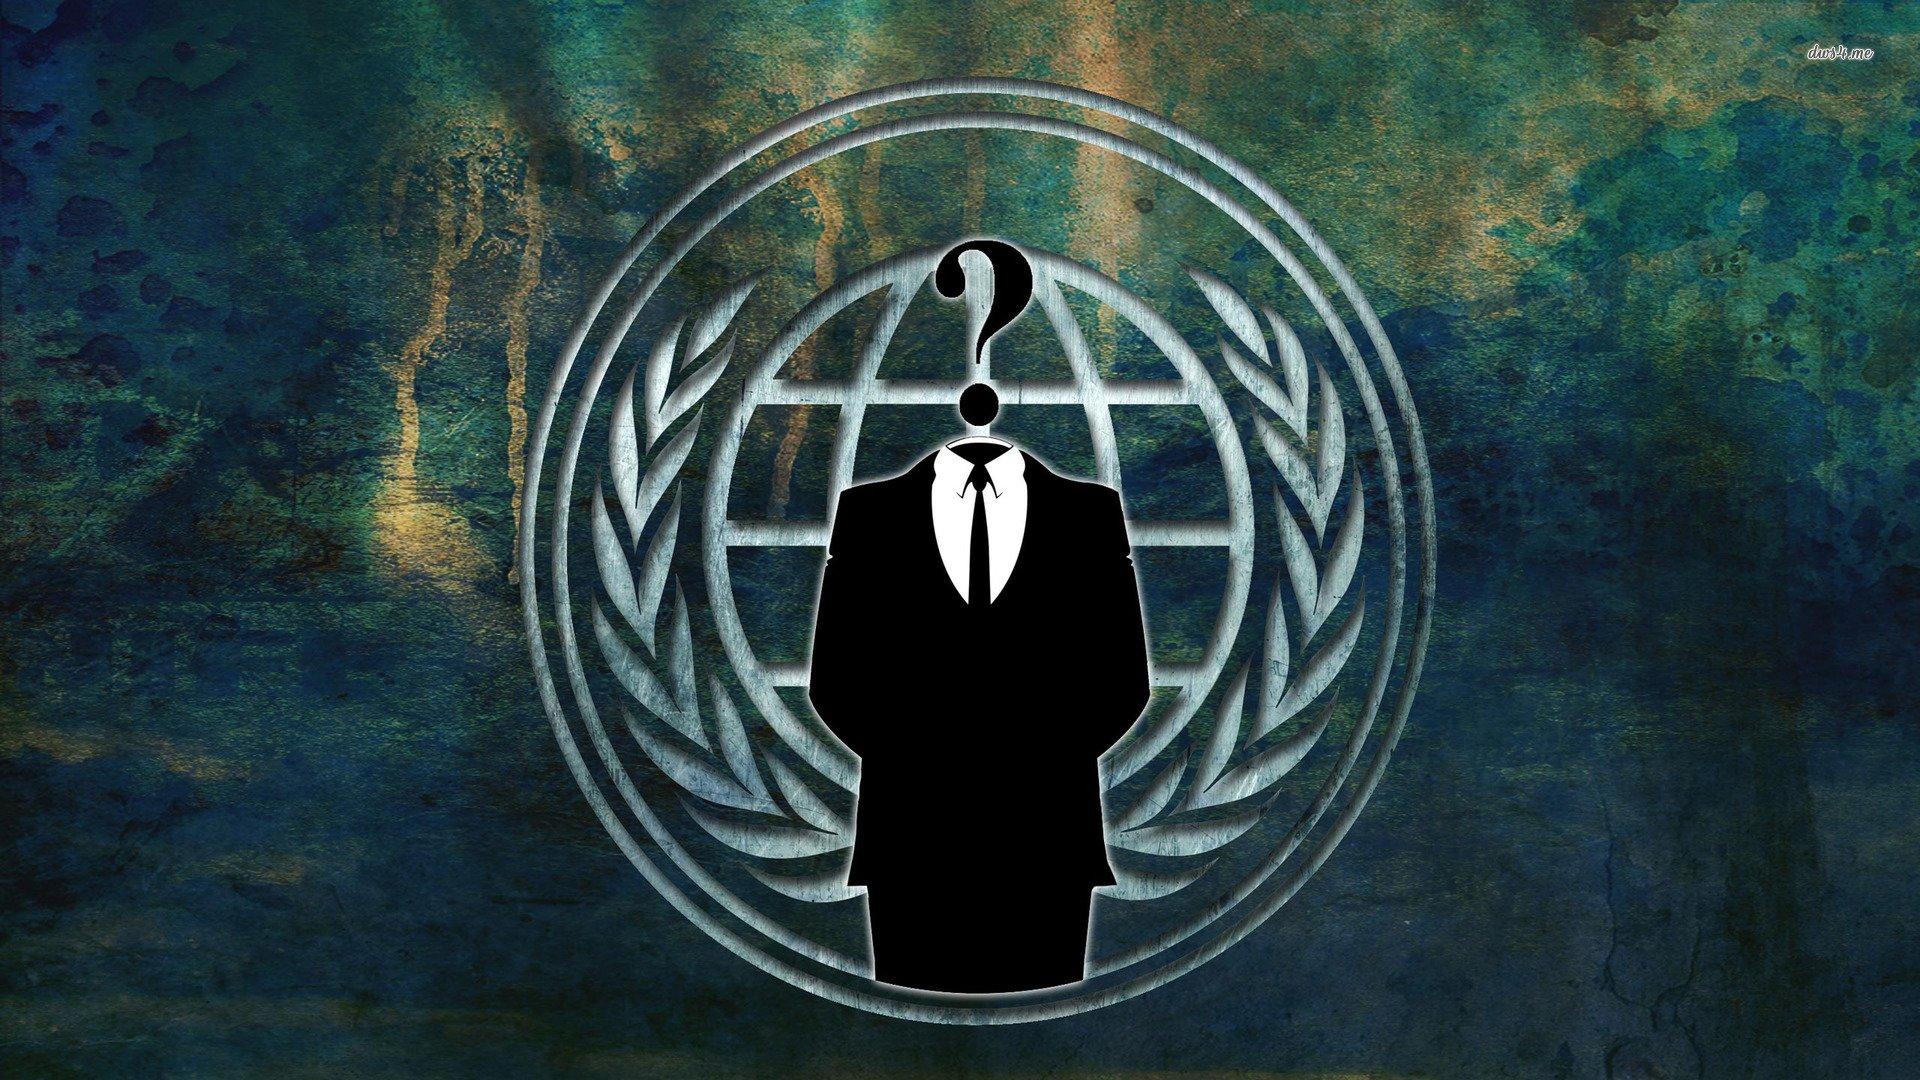 Anonymous Wallpaper x